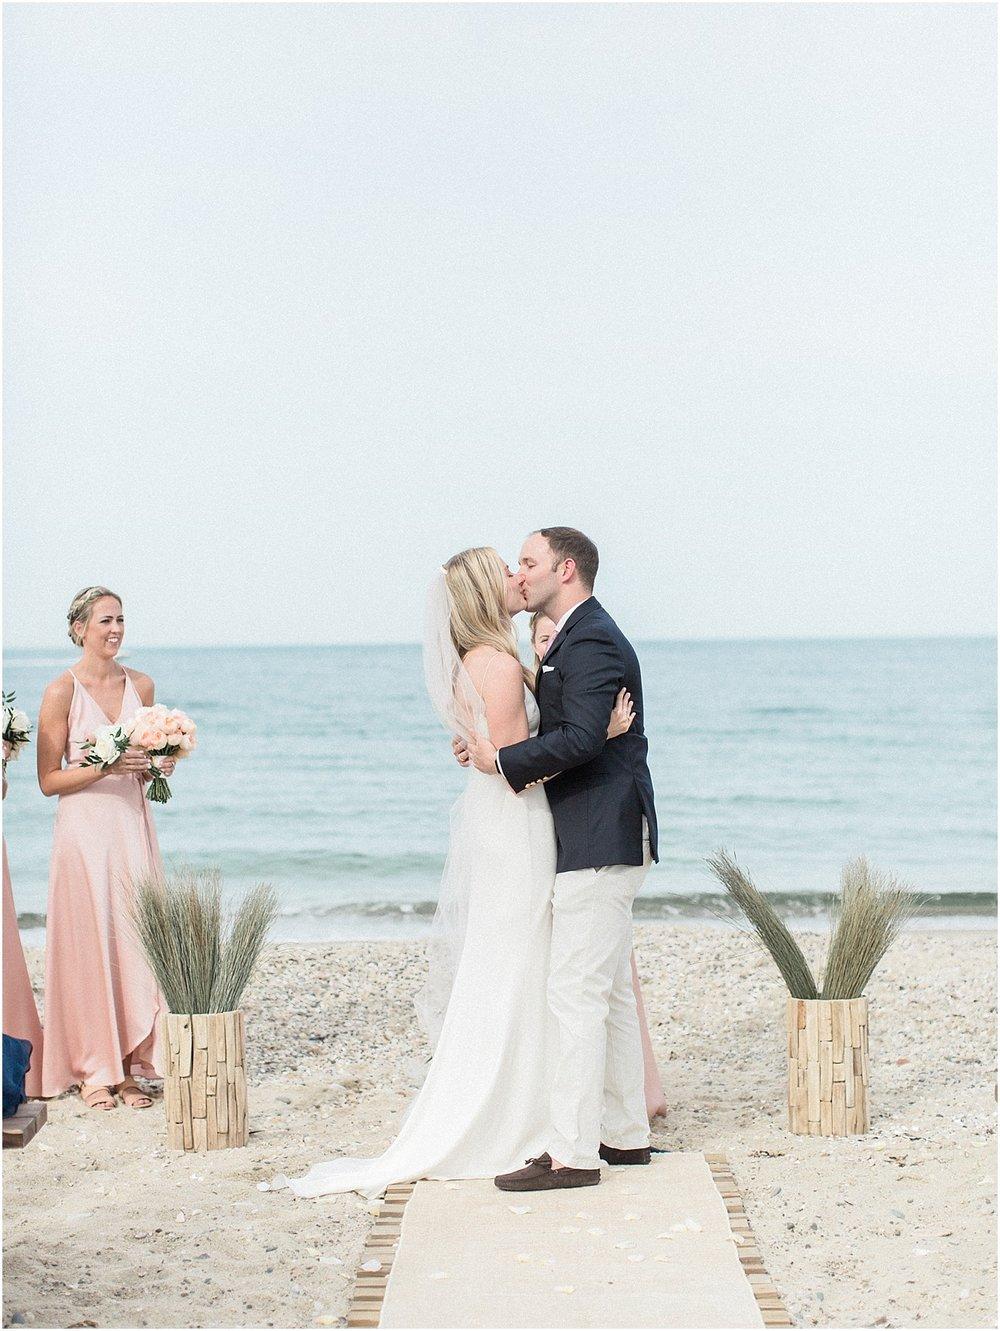 holly_sj_stephen_east_chop_beach_club_marthas_martha_s_vineyard_cape_cod_boston_wedding_photographer_meredith_jane_photography_photo_0244.jpg